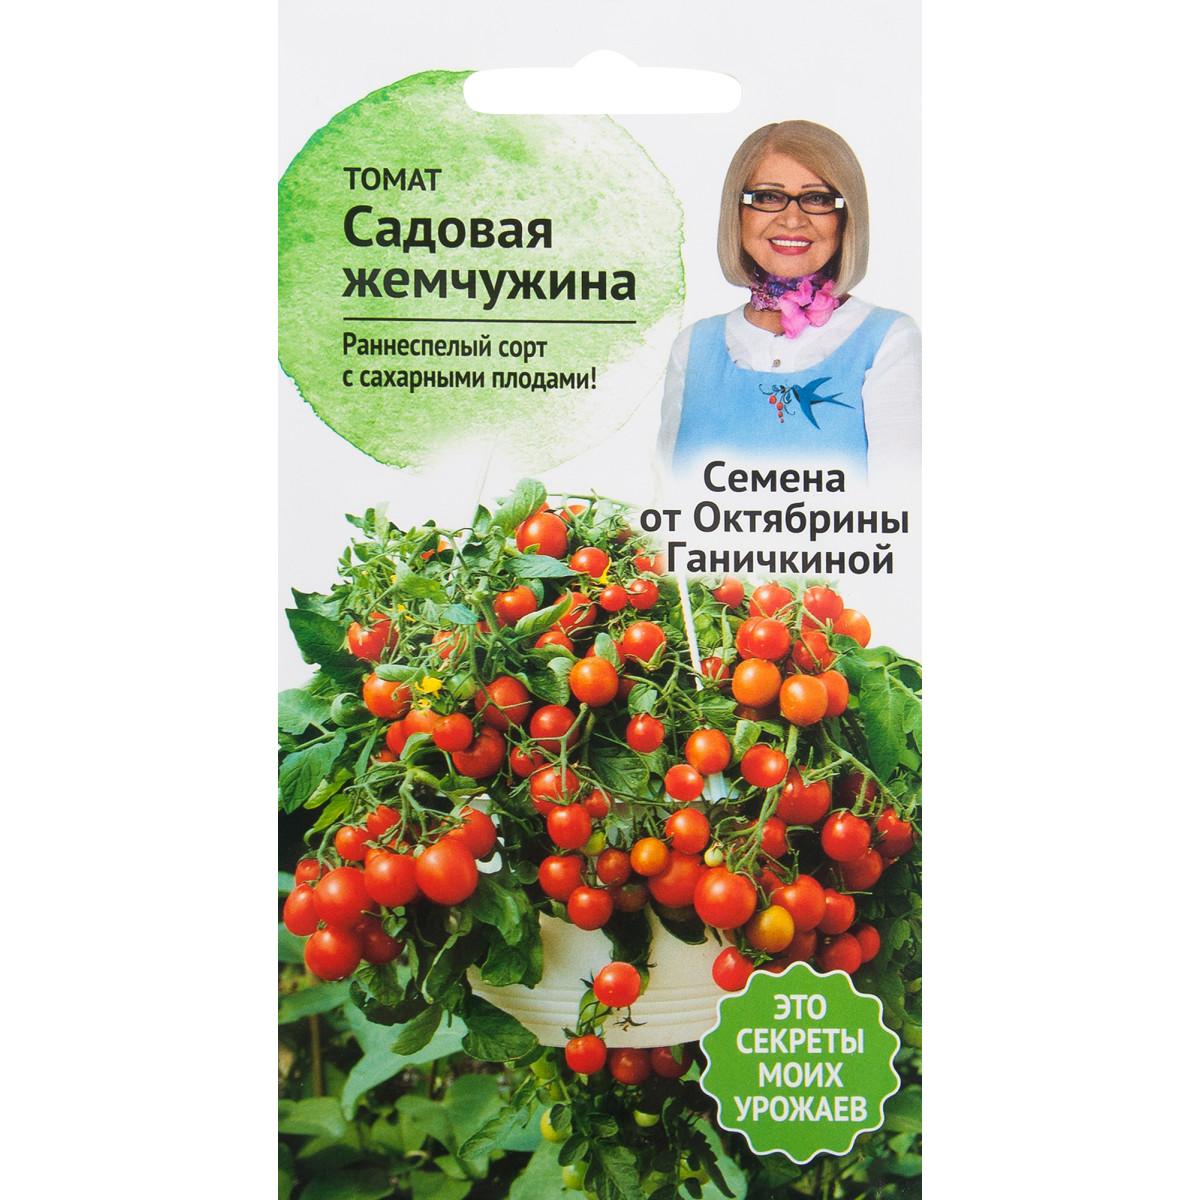 Семена Томат Садовая жемчужина 10 шт.